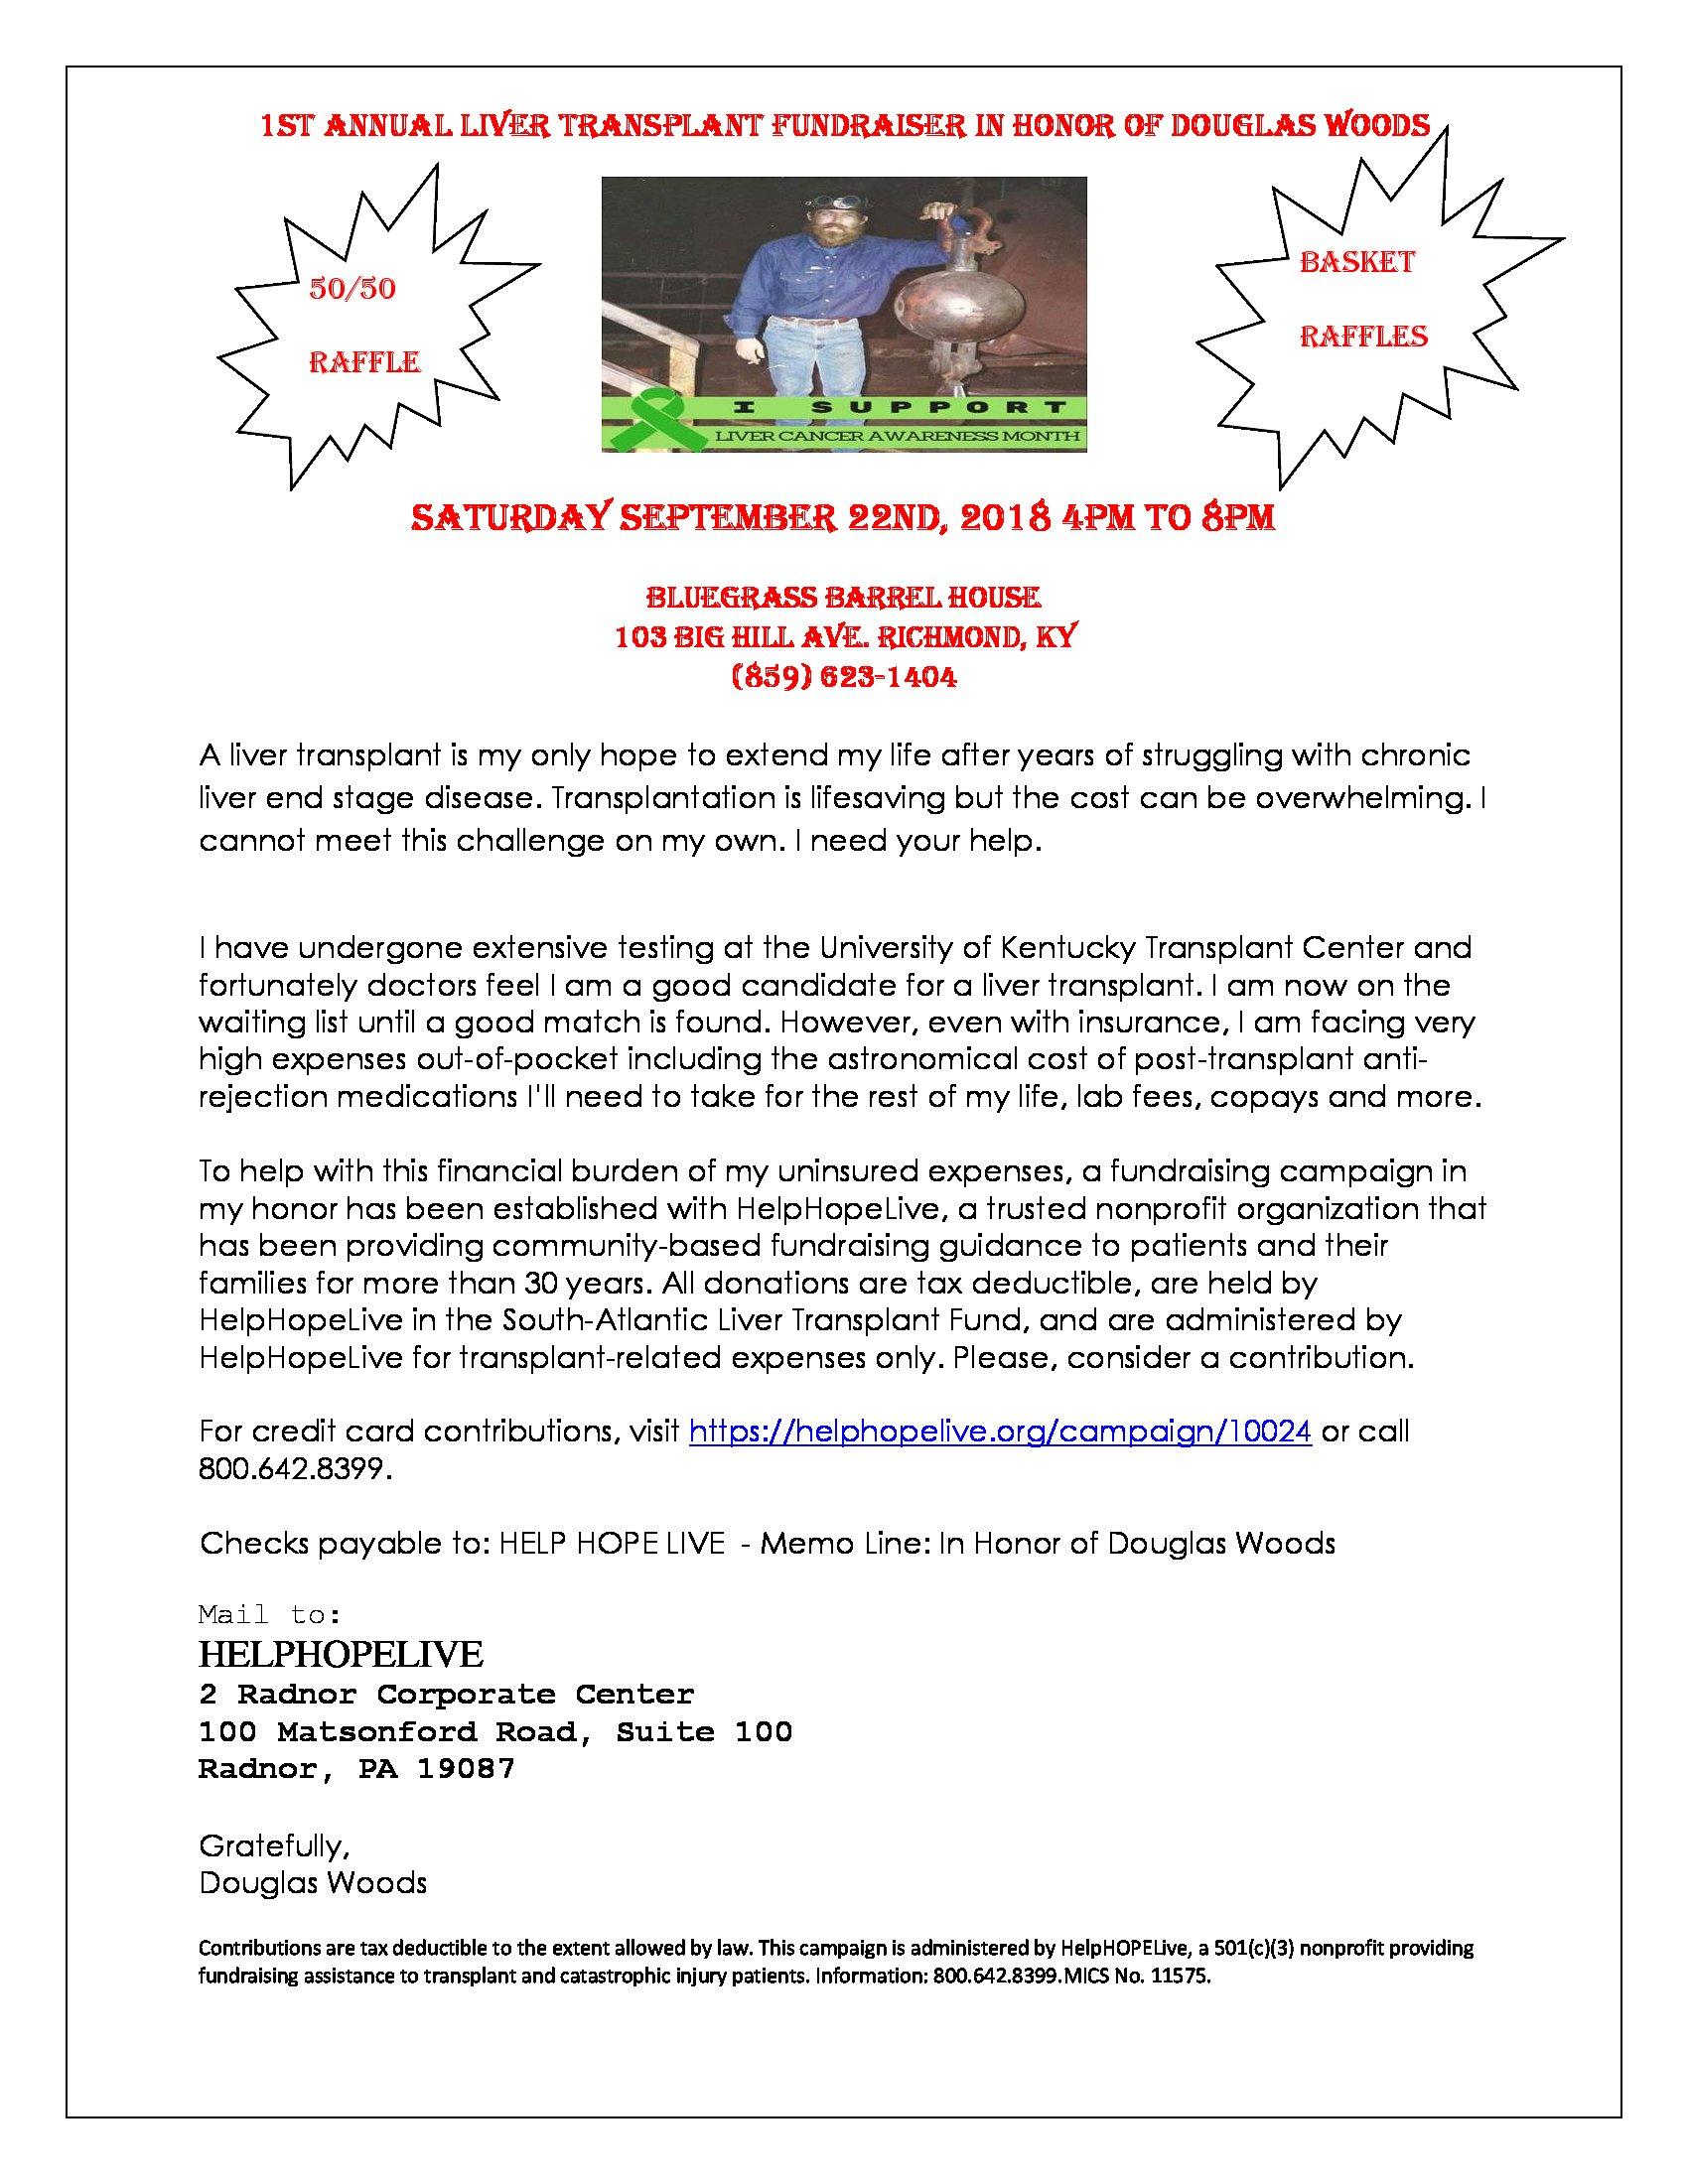 1ST Annual Liver Transplant Fundraiser